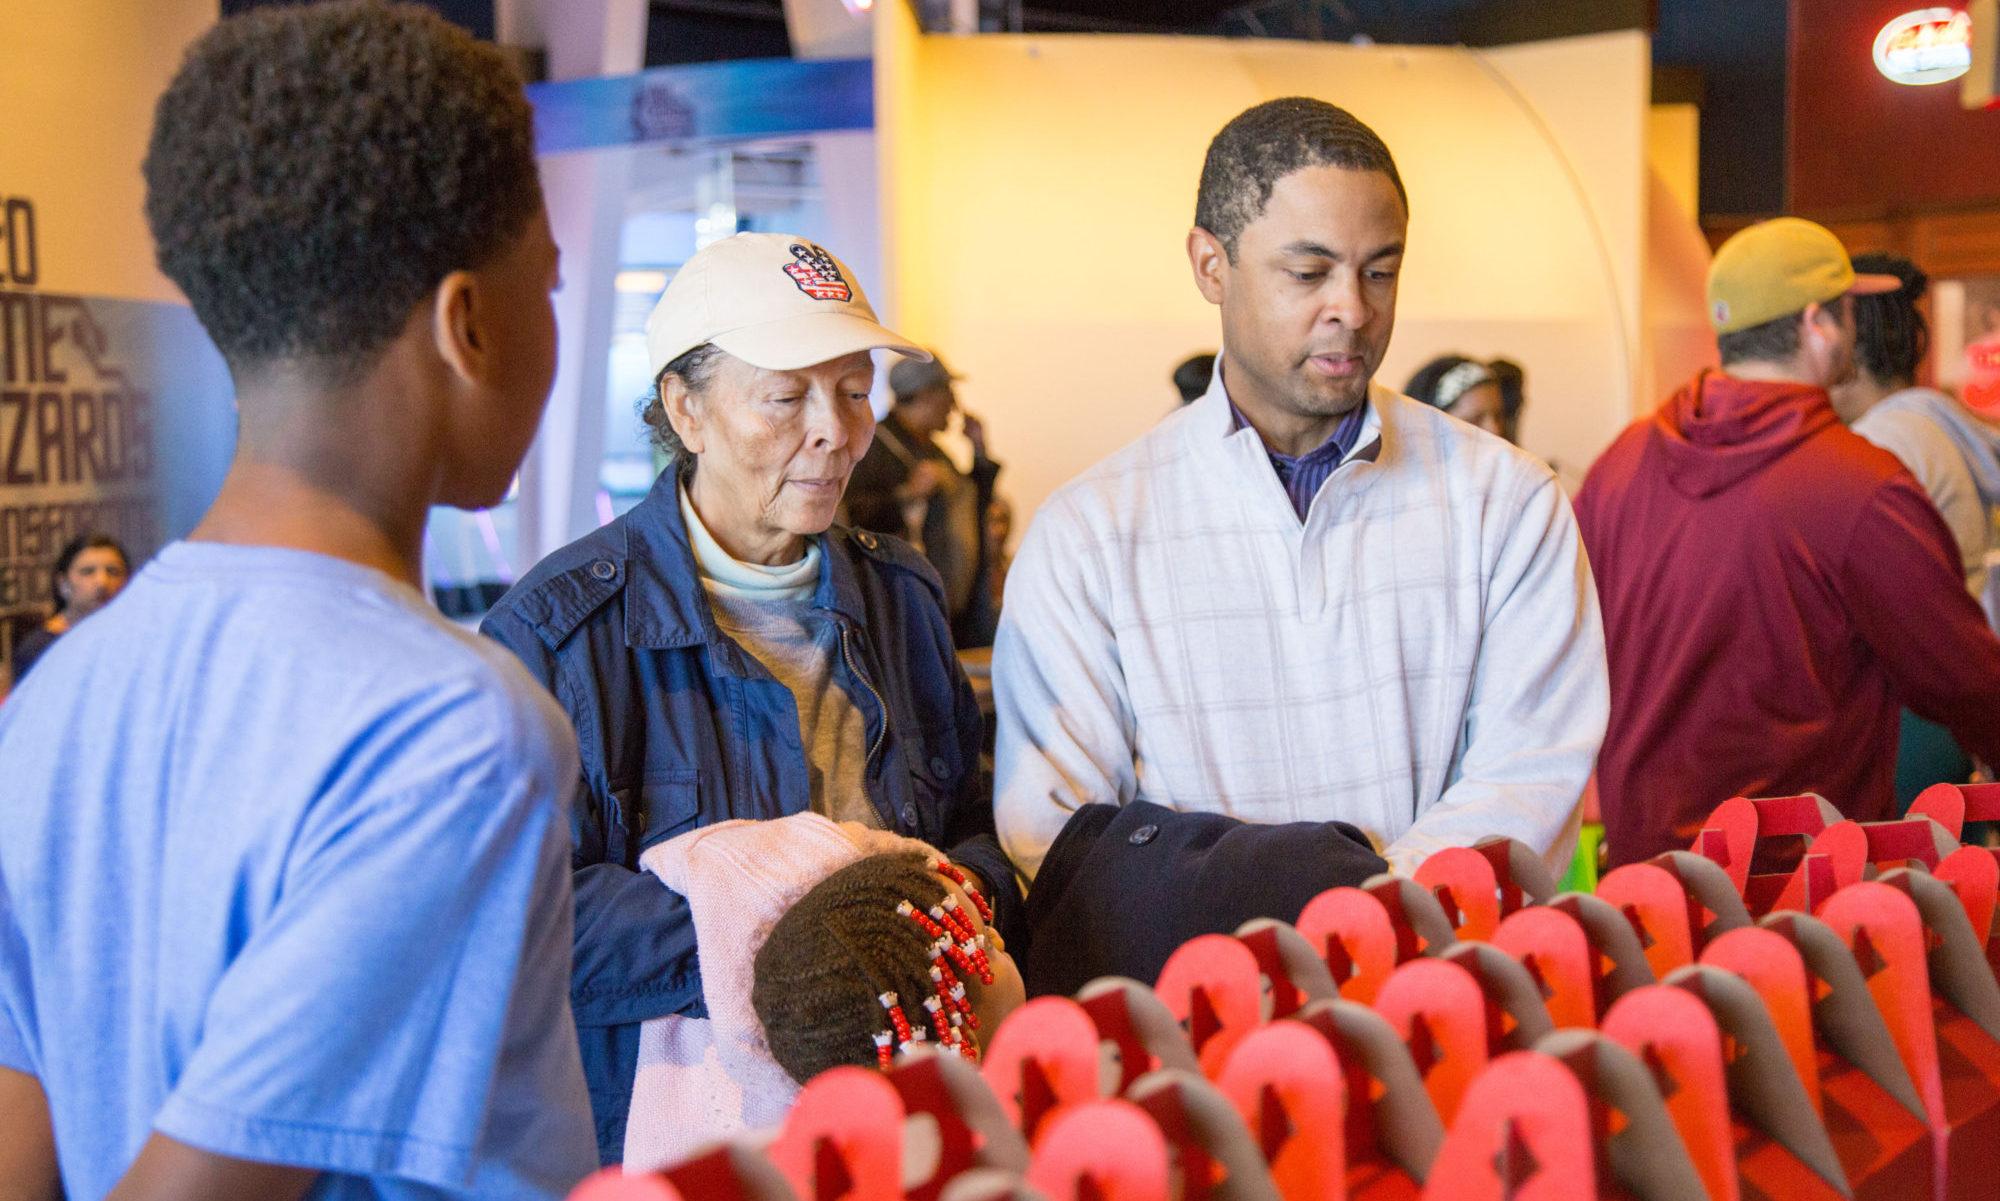 Baltimore Children's Business Fair